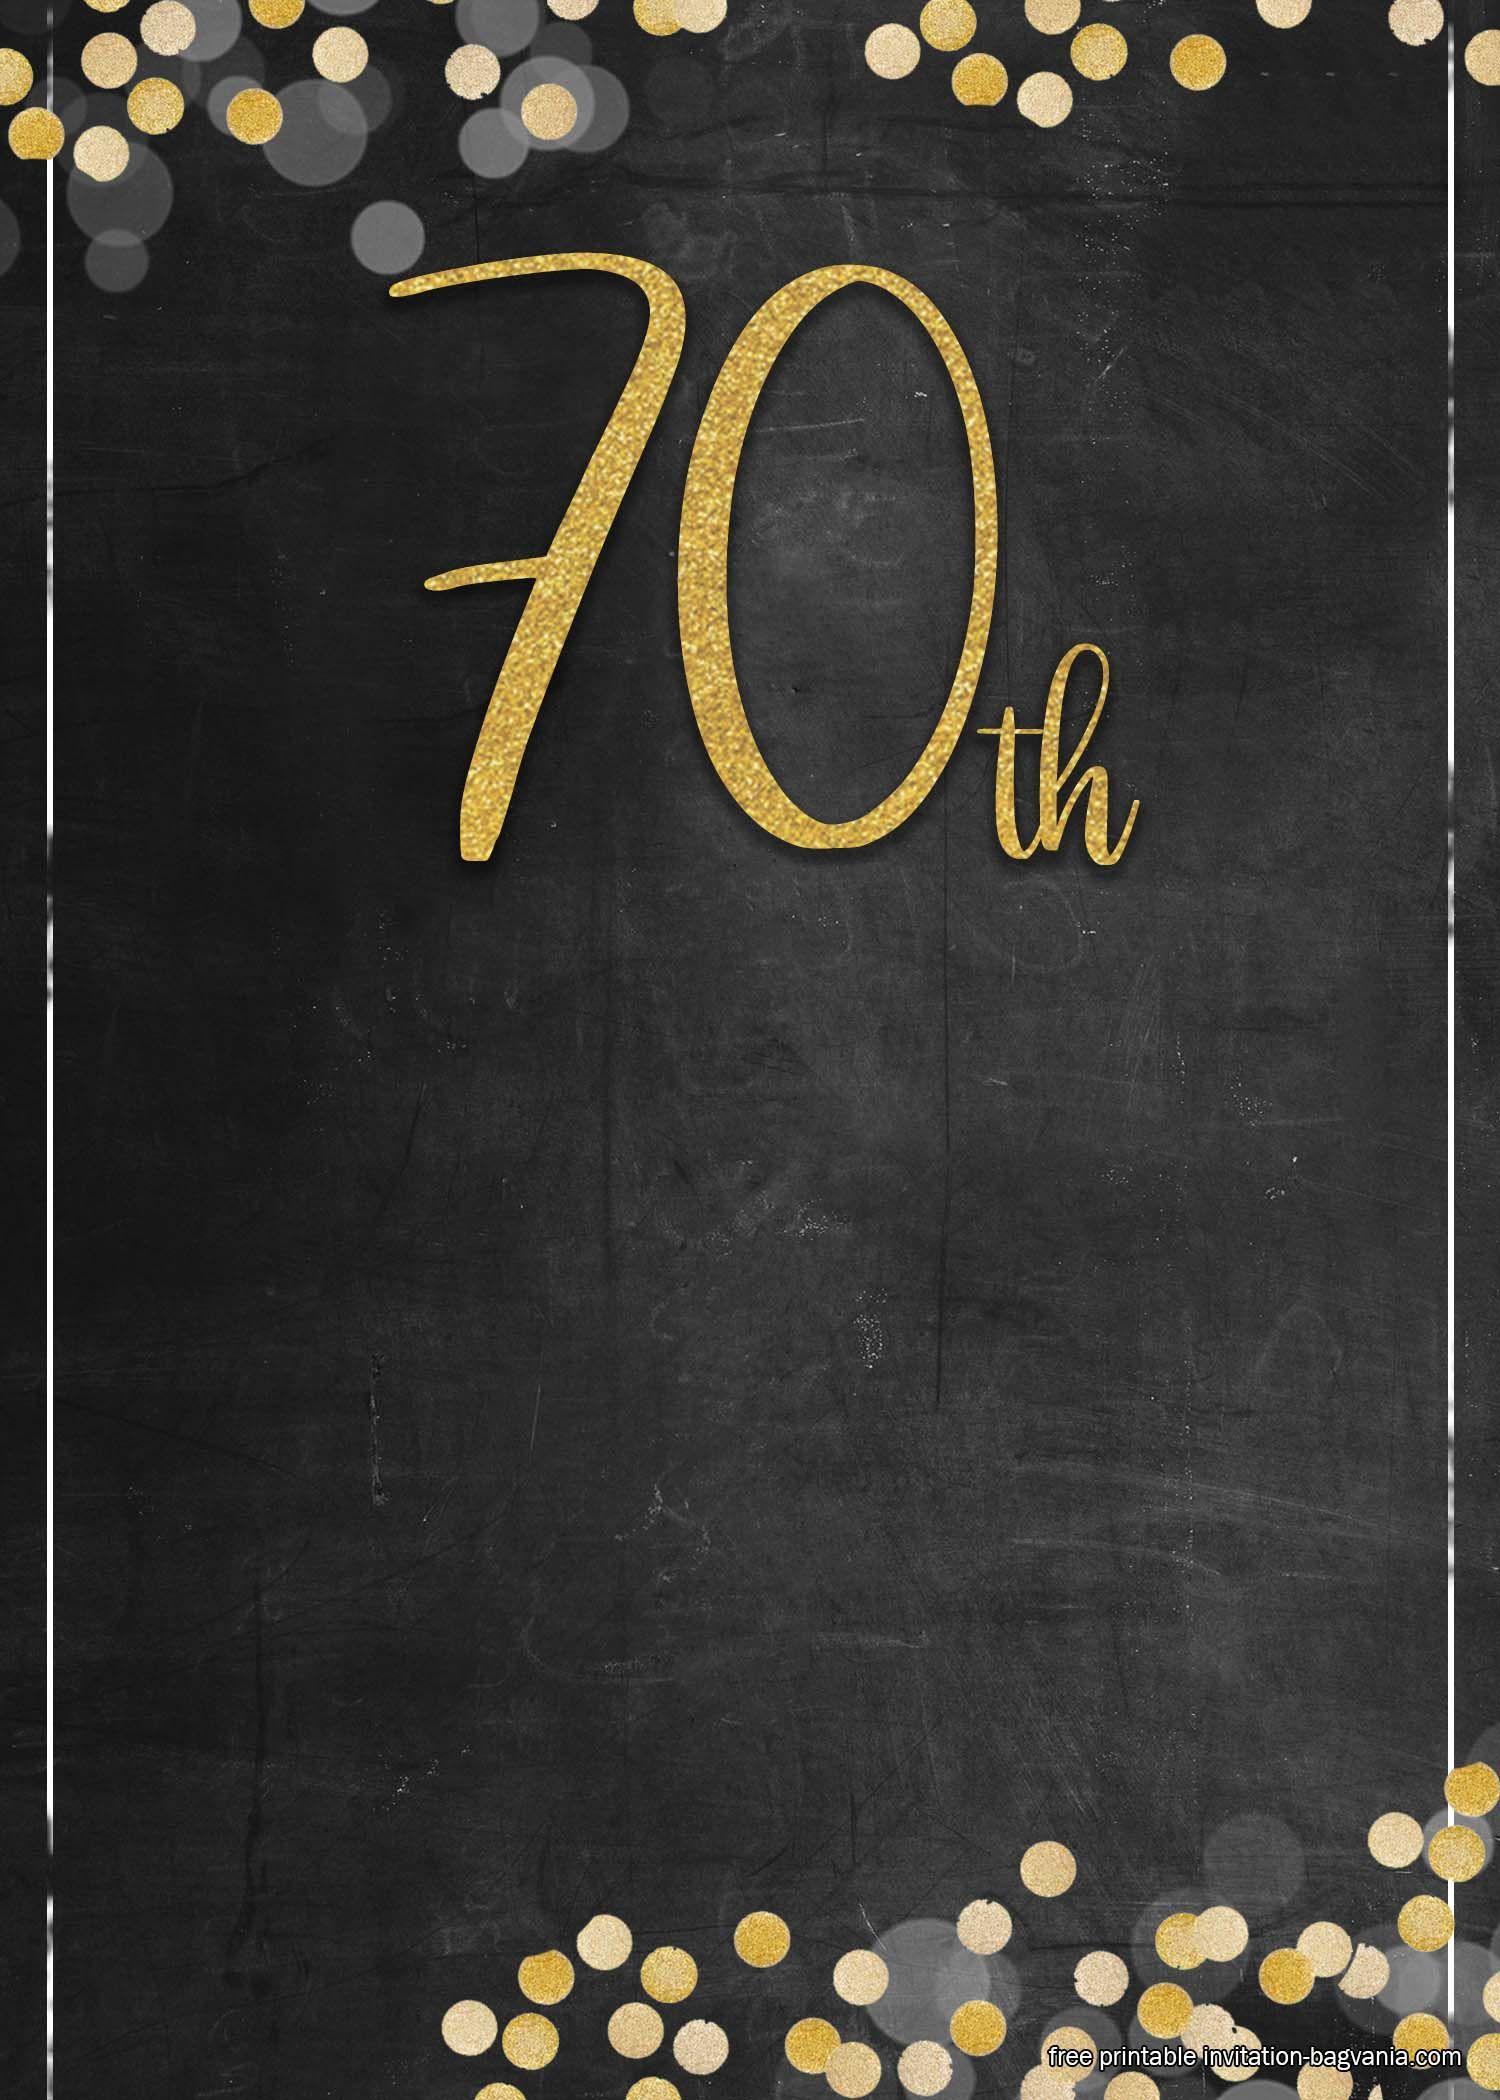 Free Printable 70th Birthday Invitation Templates 70th Birthday Invitations Birthday Template Birthday Invitations 70th birthday invitation templates free